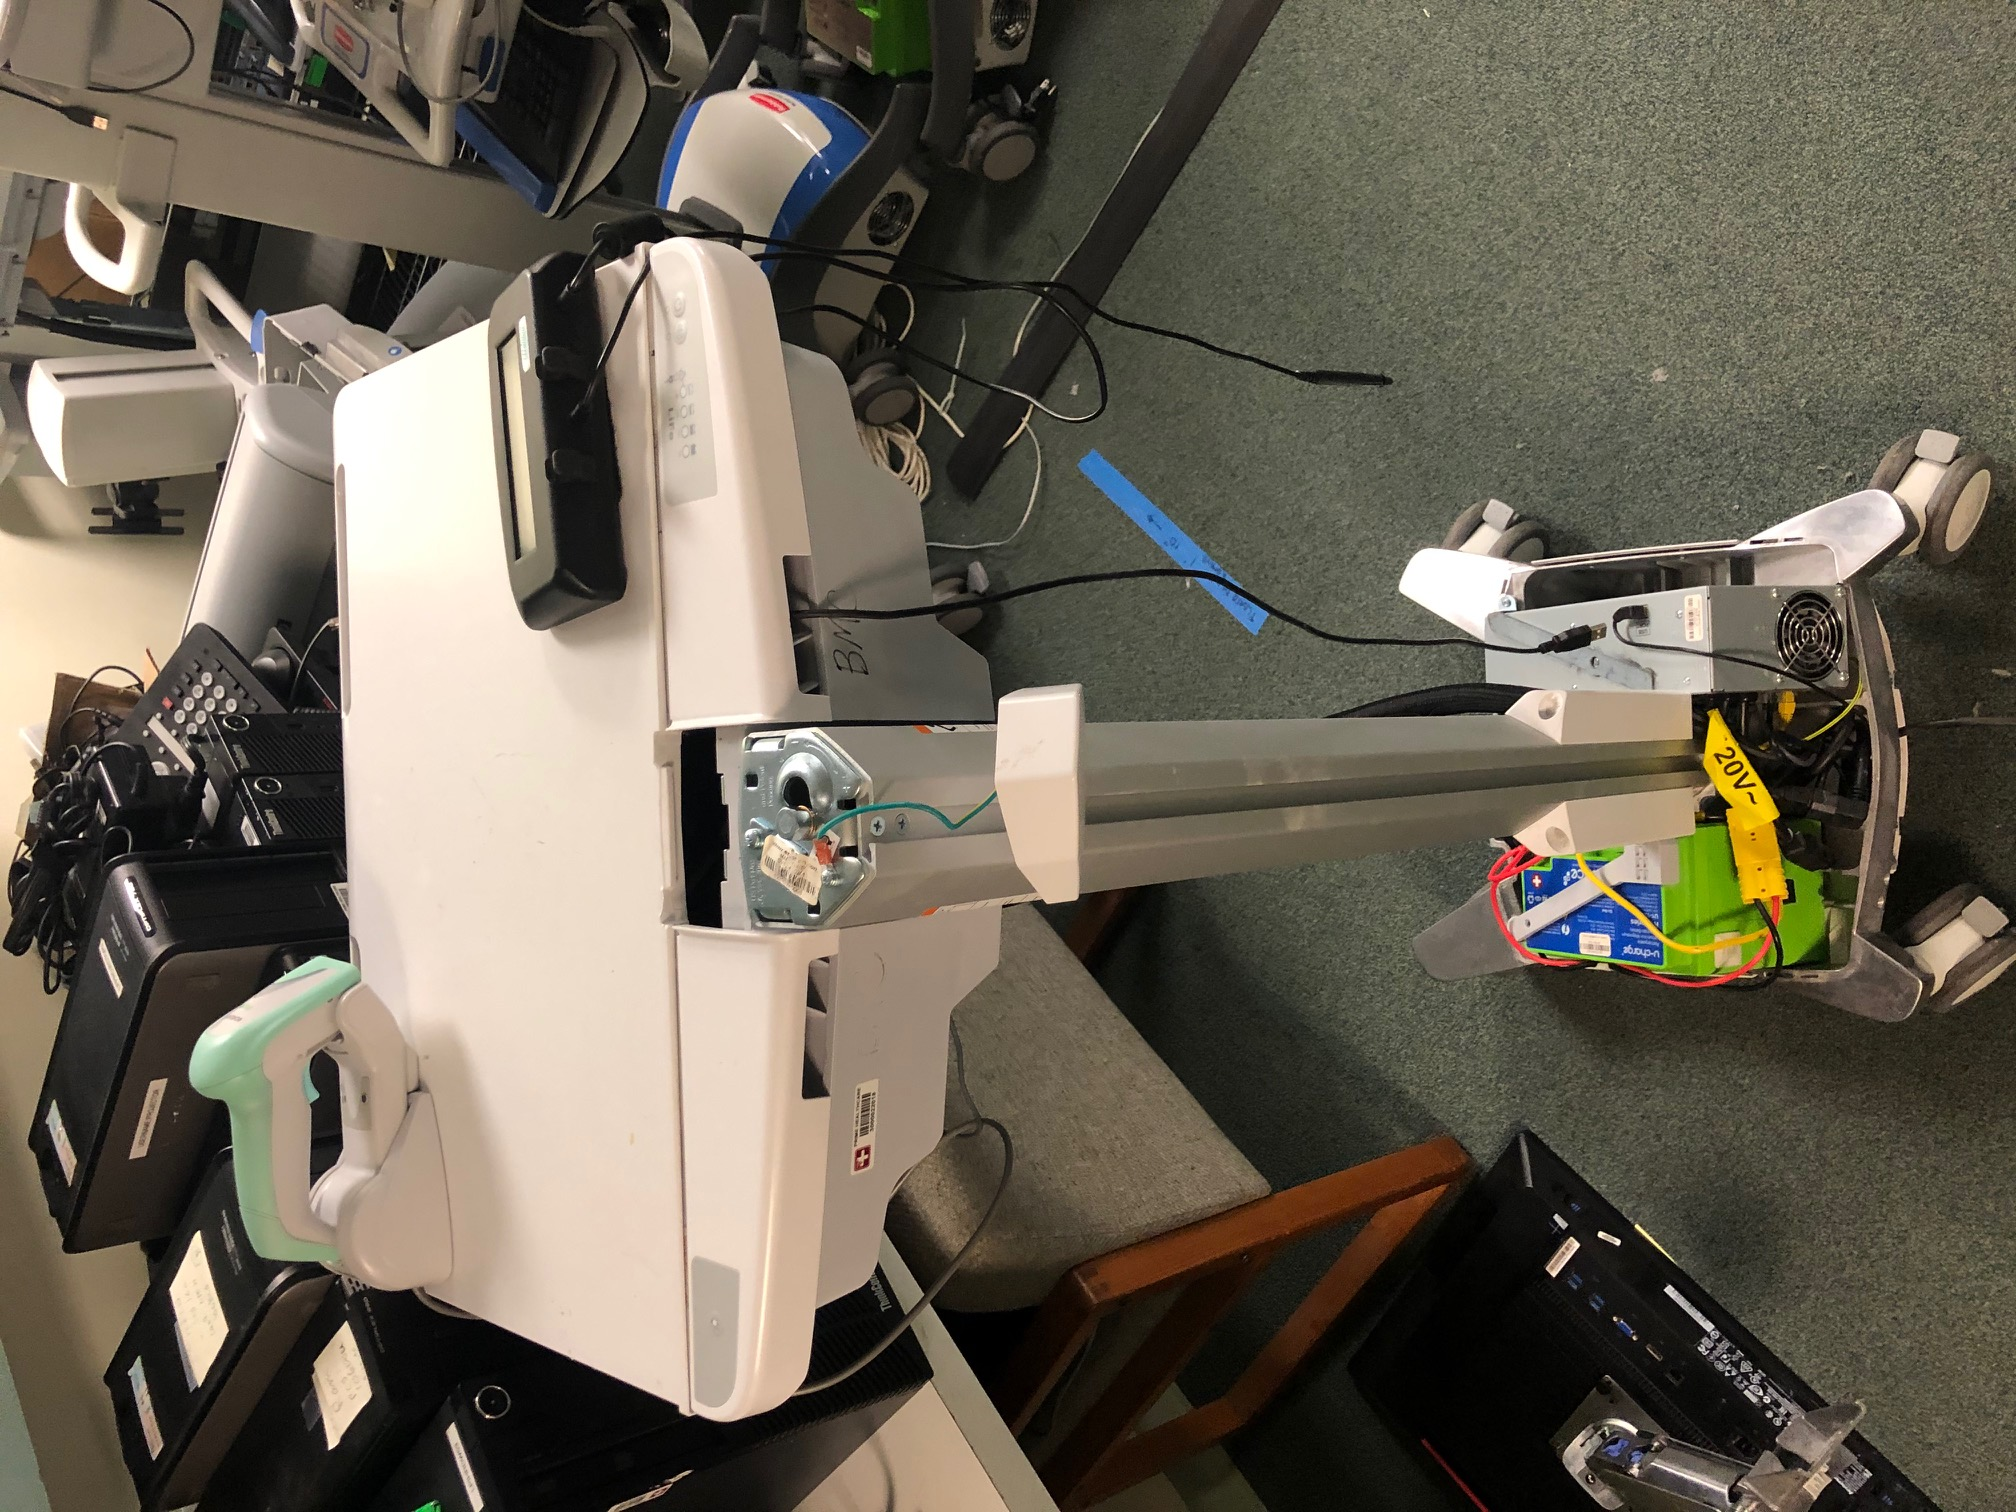 Repairing Lift Engine on Cart (WOW)